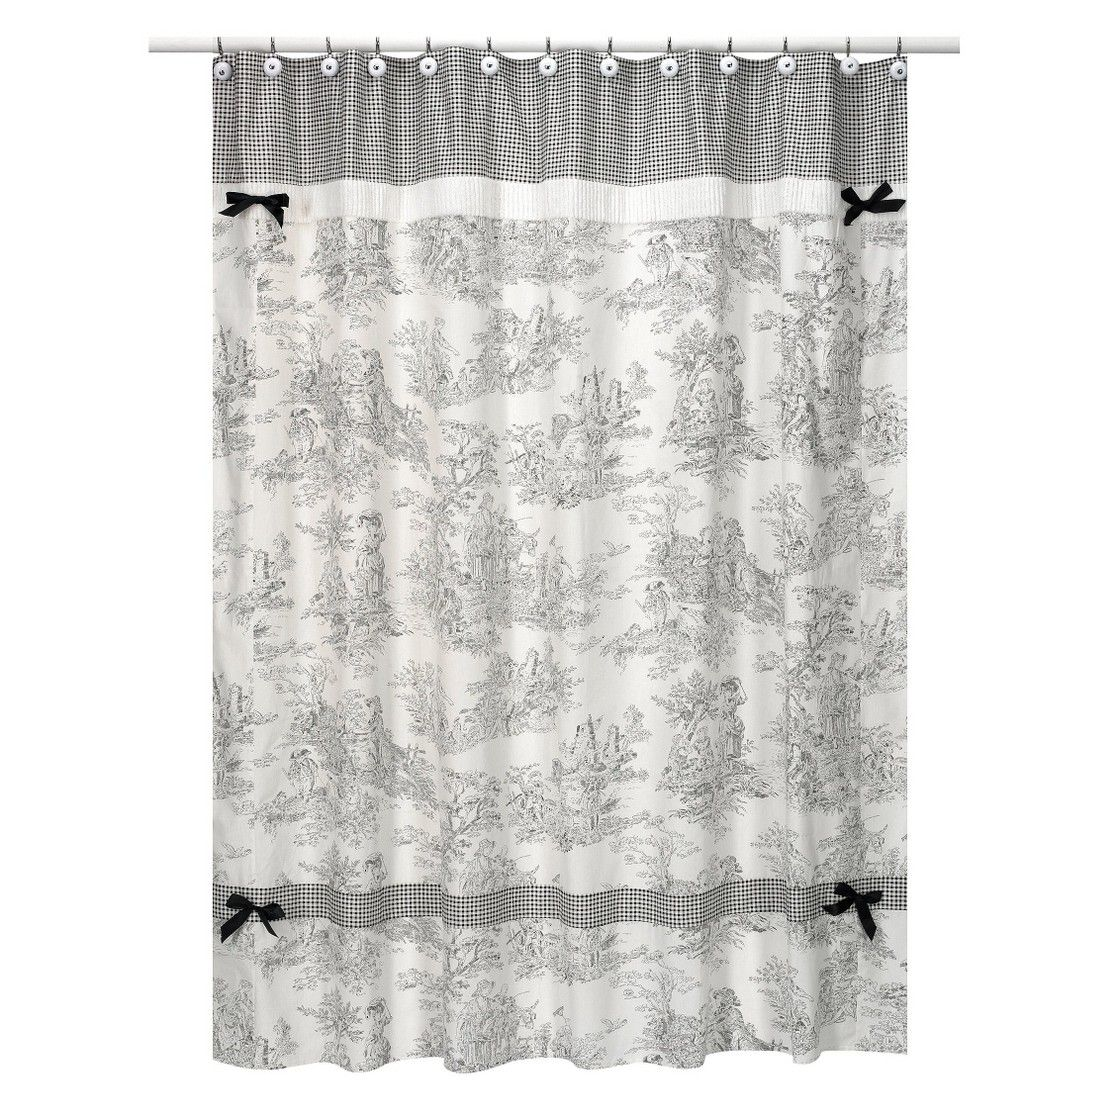 Sweet jojo designs toile shower curtain black toile bath ideas